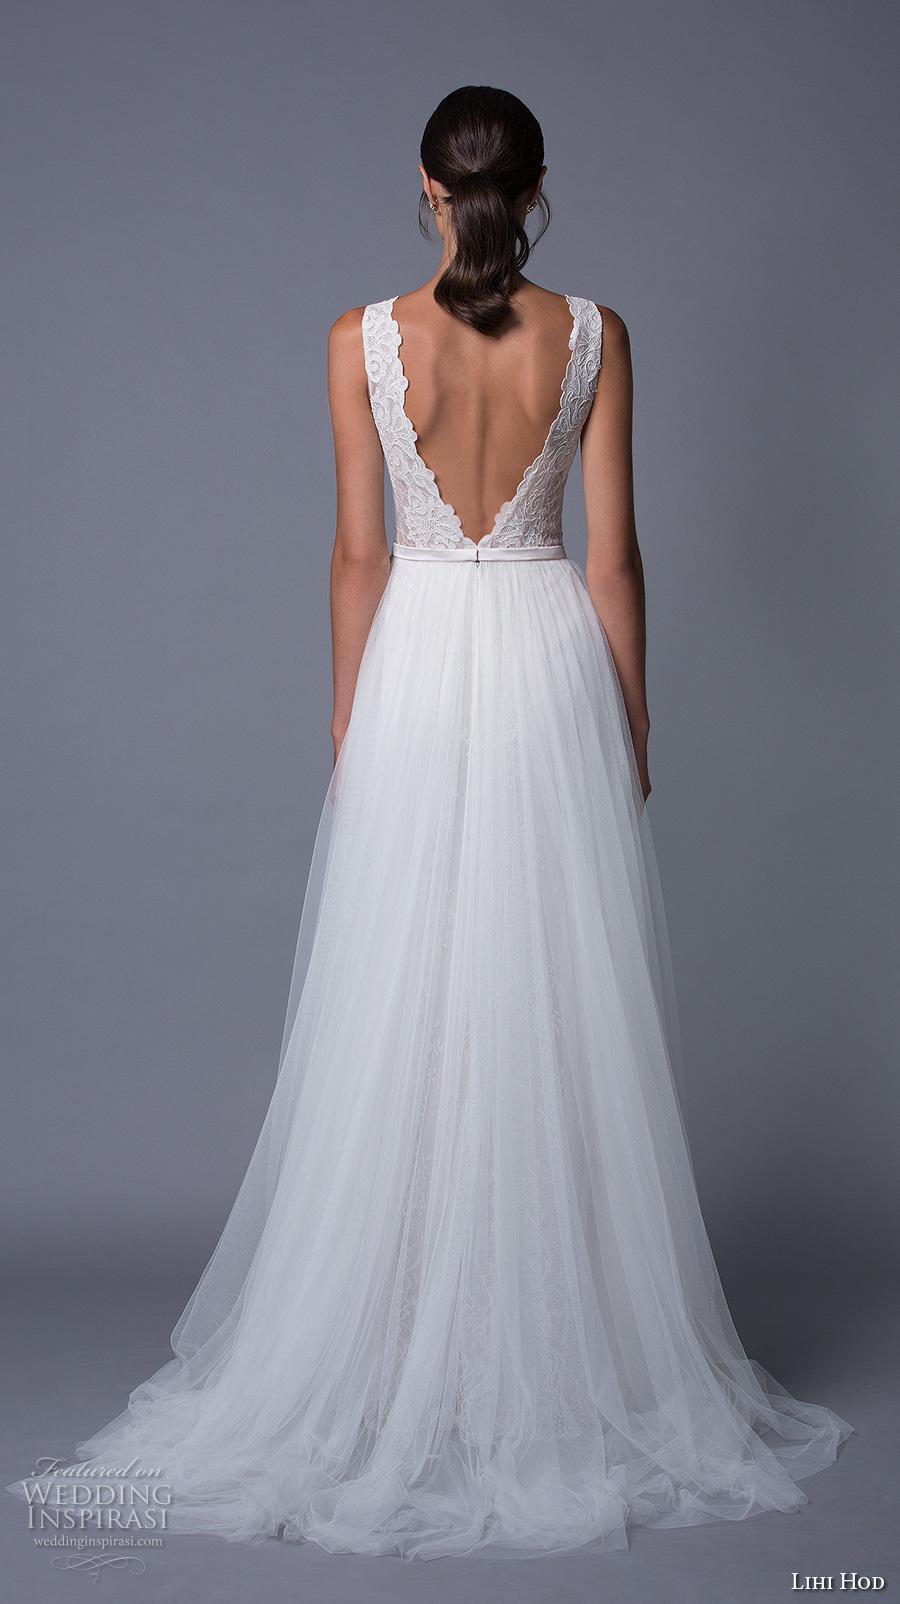 Milanoo Wedding Dresses 95 Luxury lihi hod bridal sleeveless